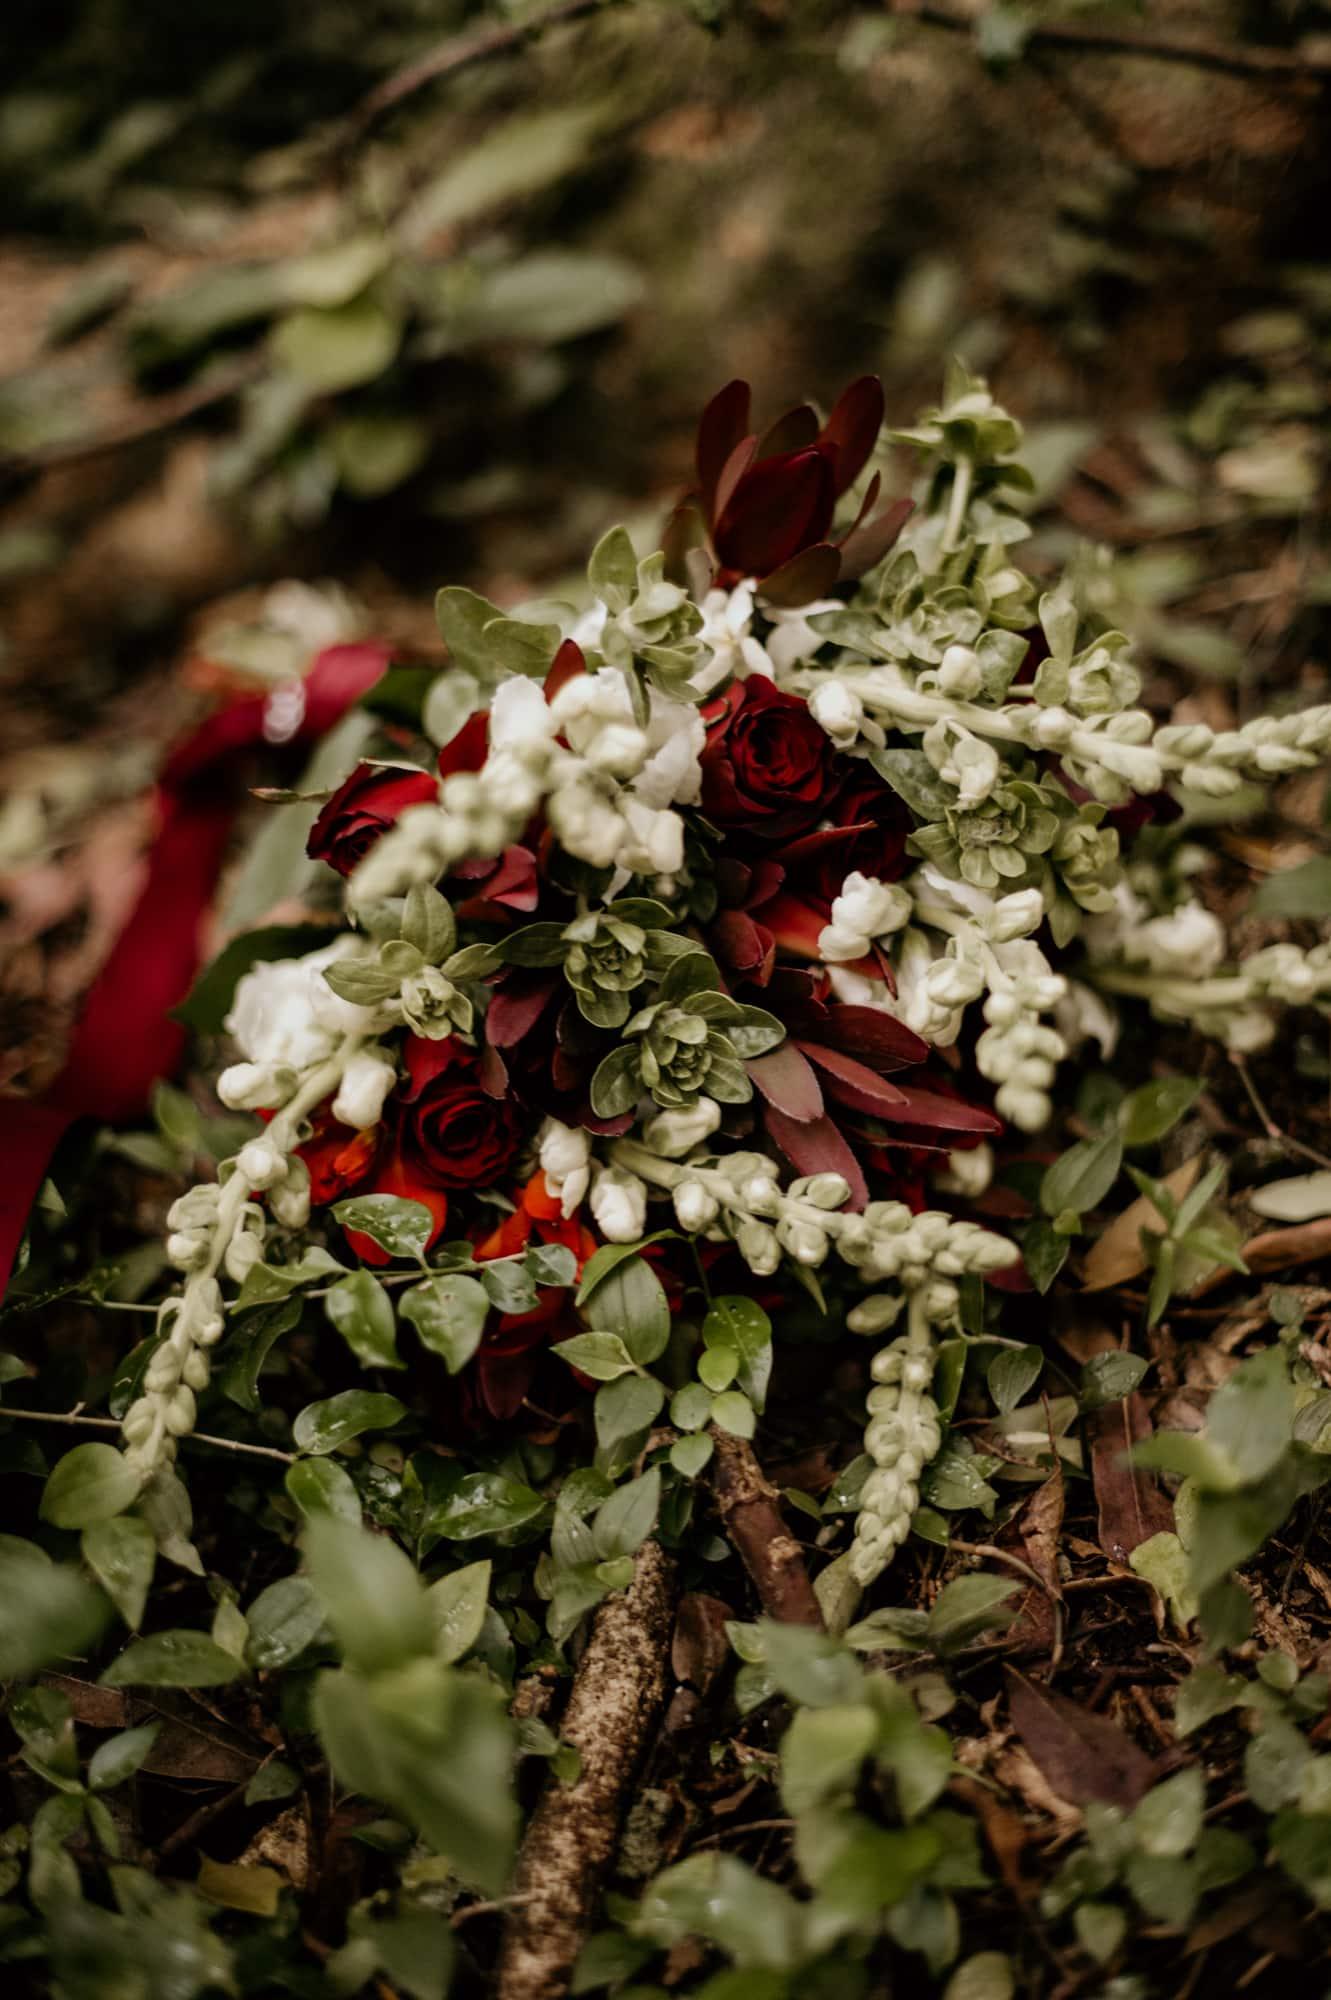 wesley-lanie-george-fernridge-engagement-June-Richards-Photography-Destination-Weddings-Elopements-Garden-Route-36